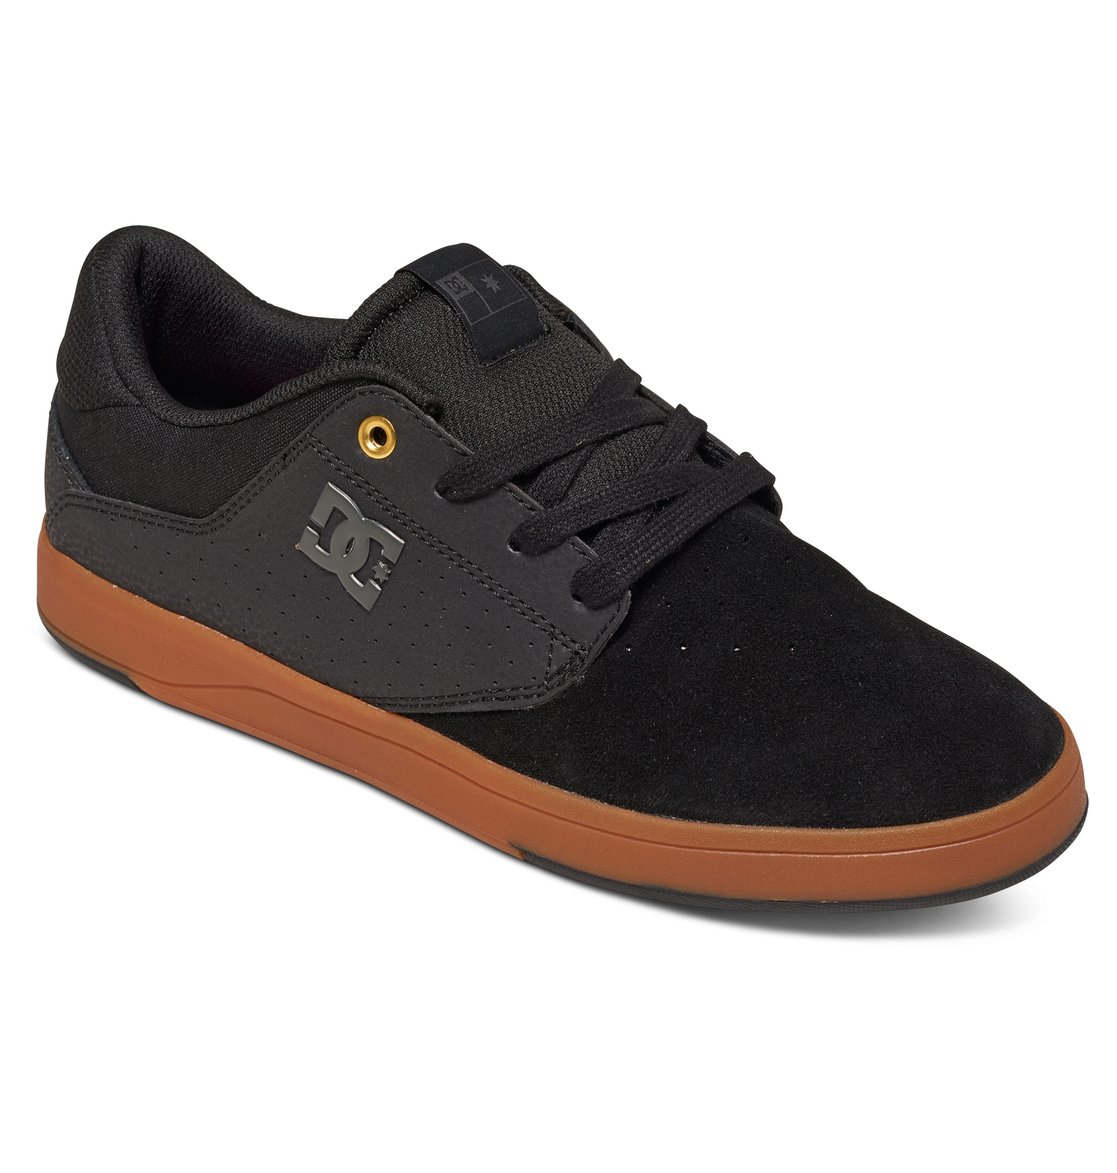 Dc Mens Plaza Tc S Shoes